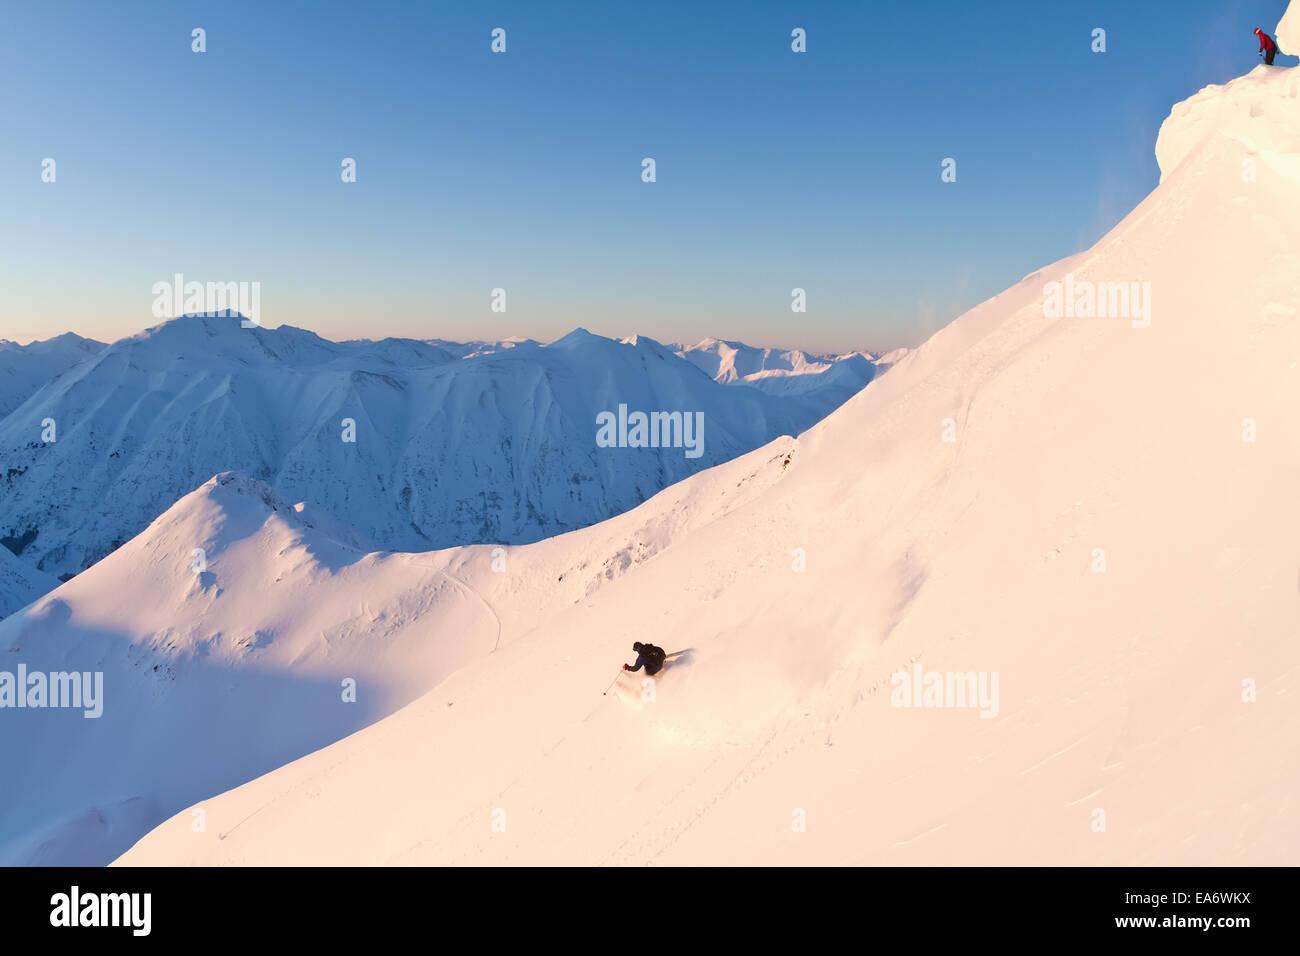 A skier watching another skier from above at Turnagain Pass, Kenai Mountains, Southcentral Alaska; Alaska, USA - Stock Image